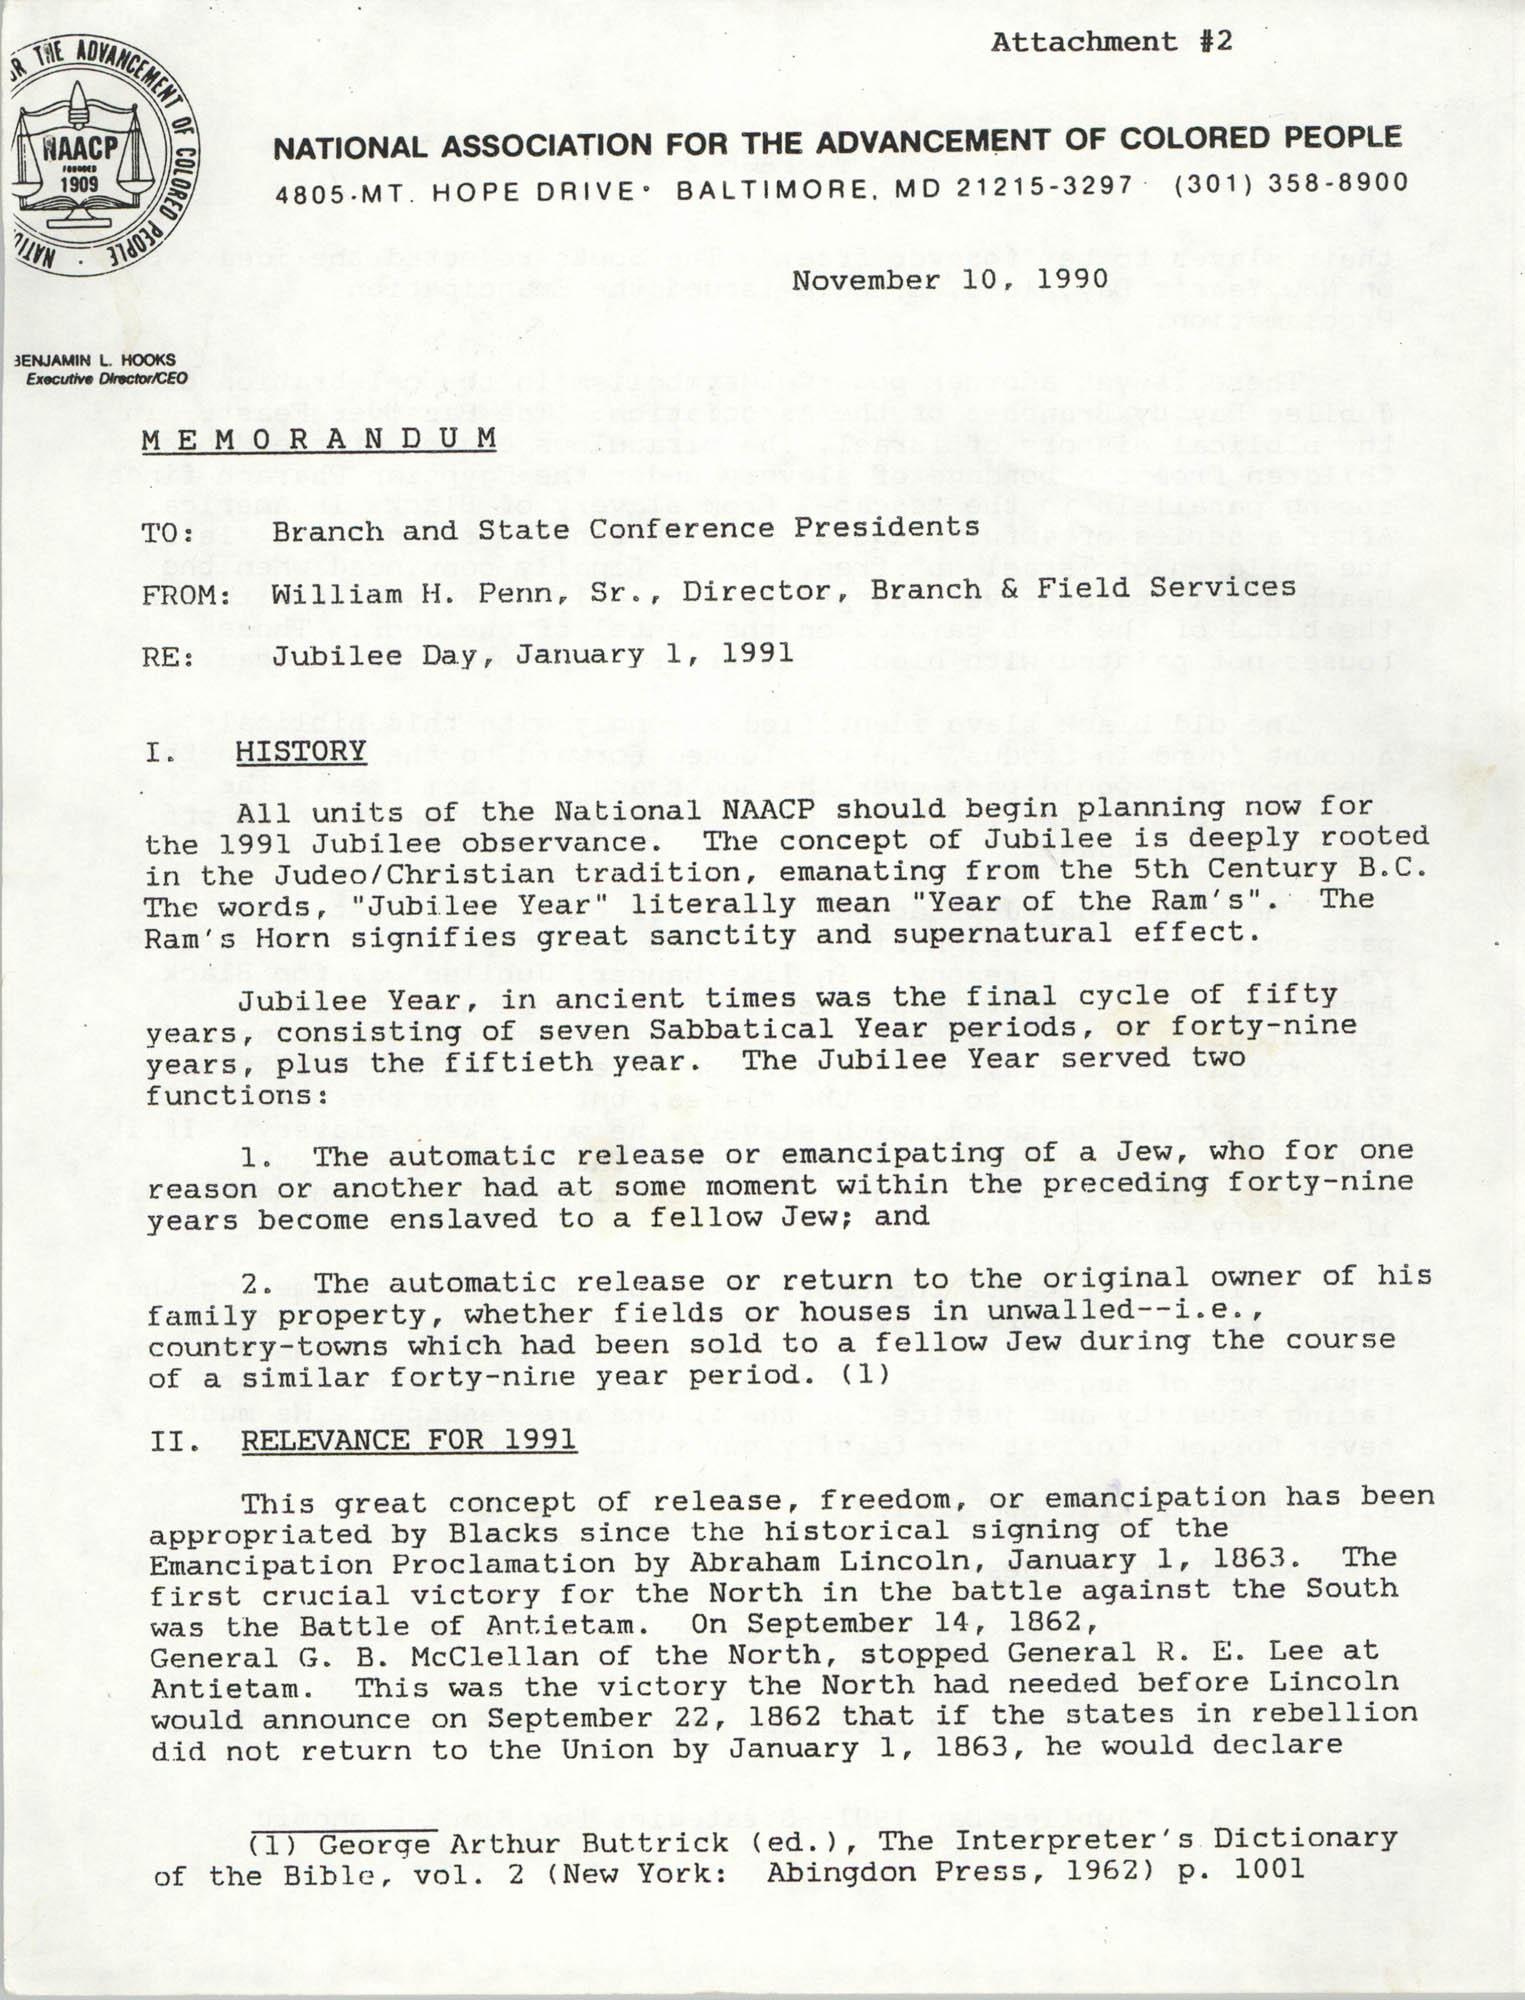 NAACP Memorandum, November 10, 1990, Page 1